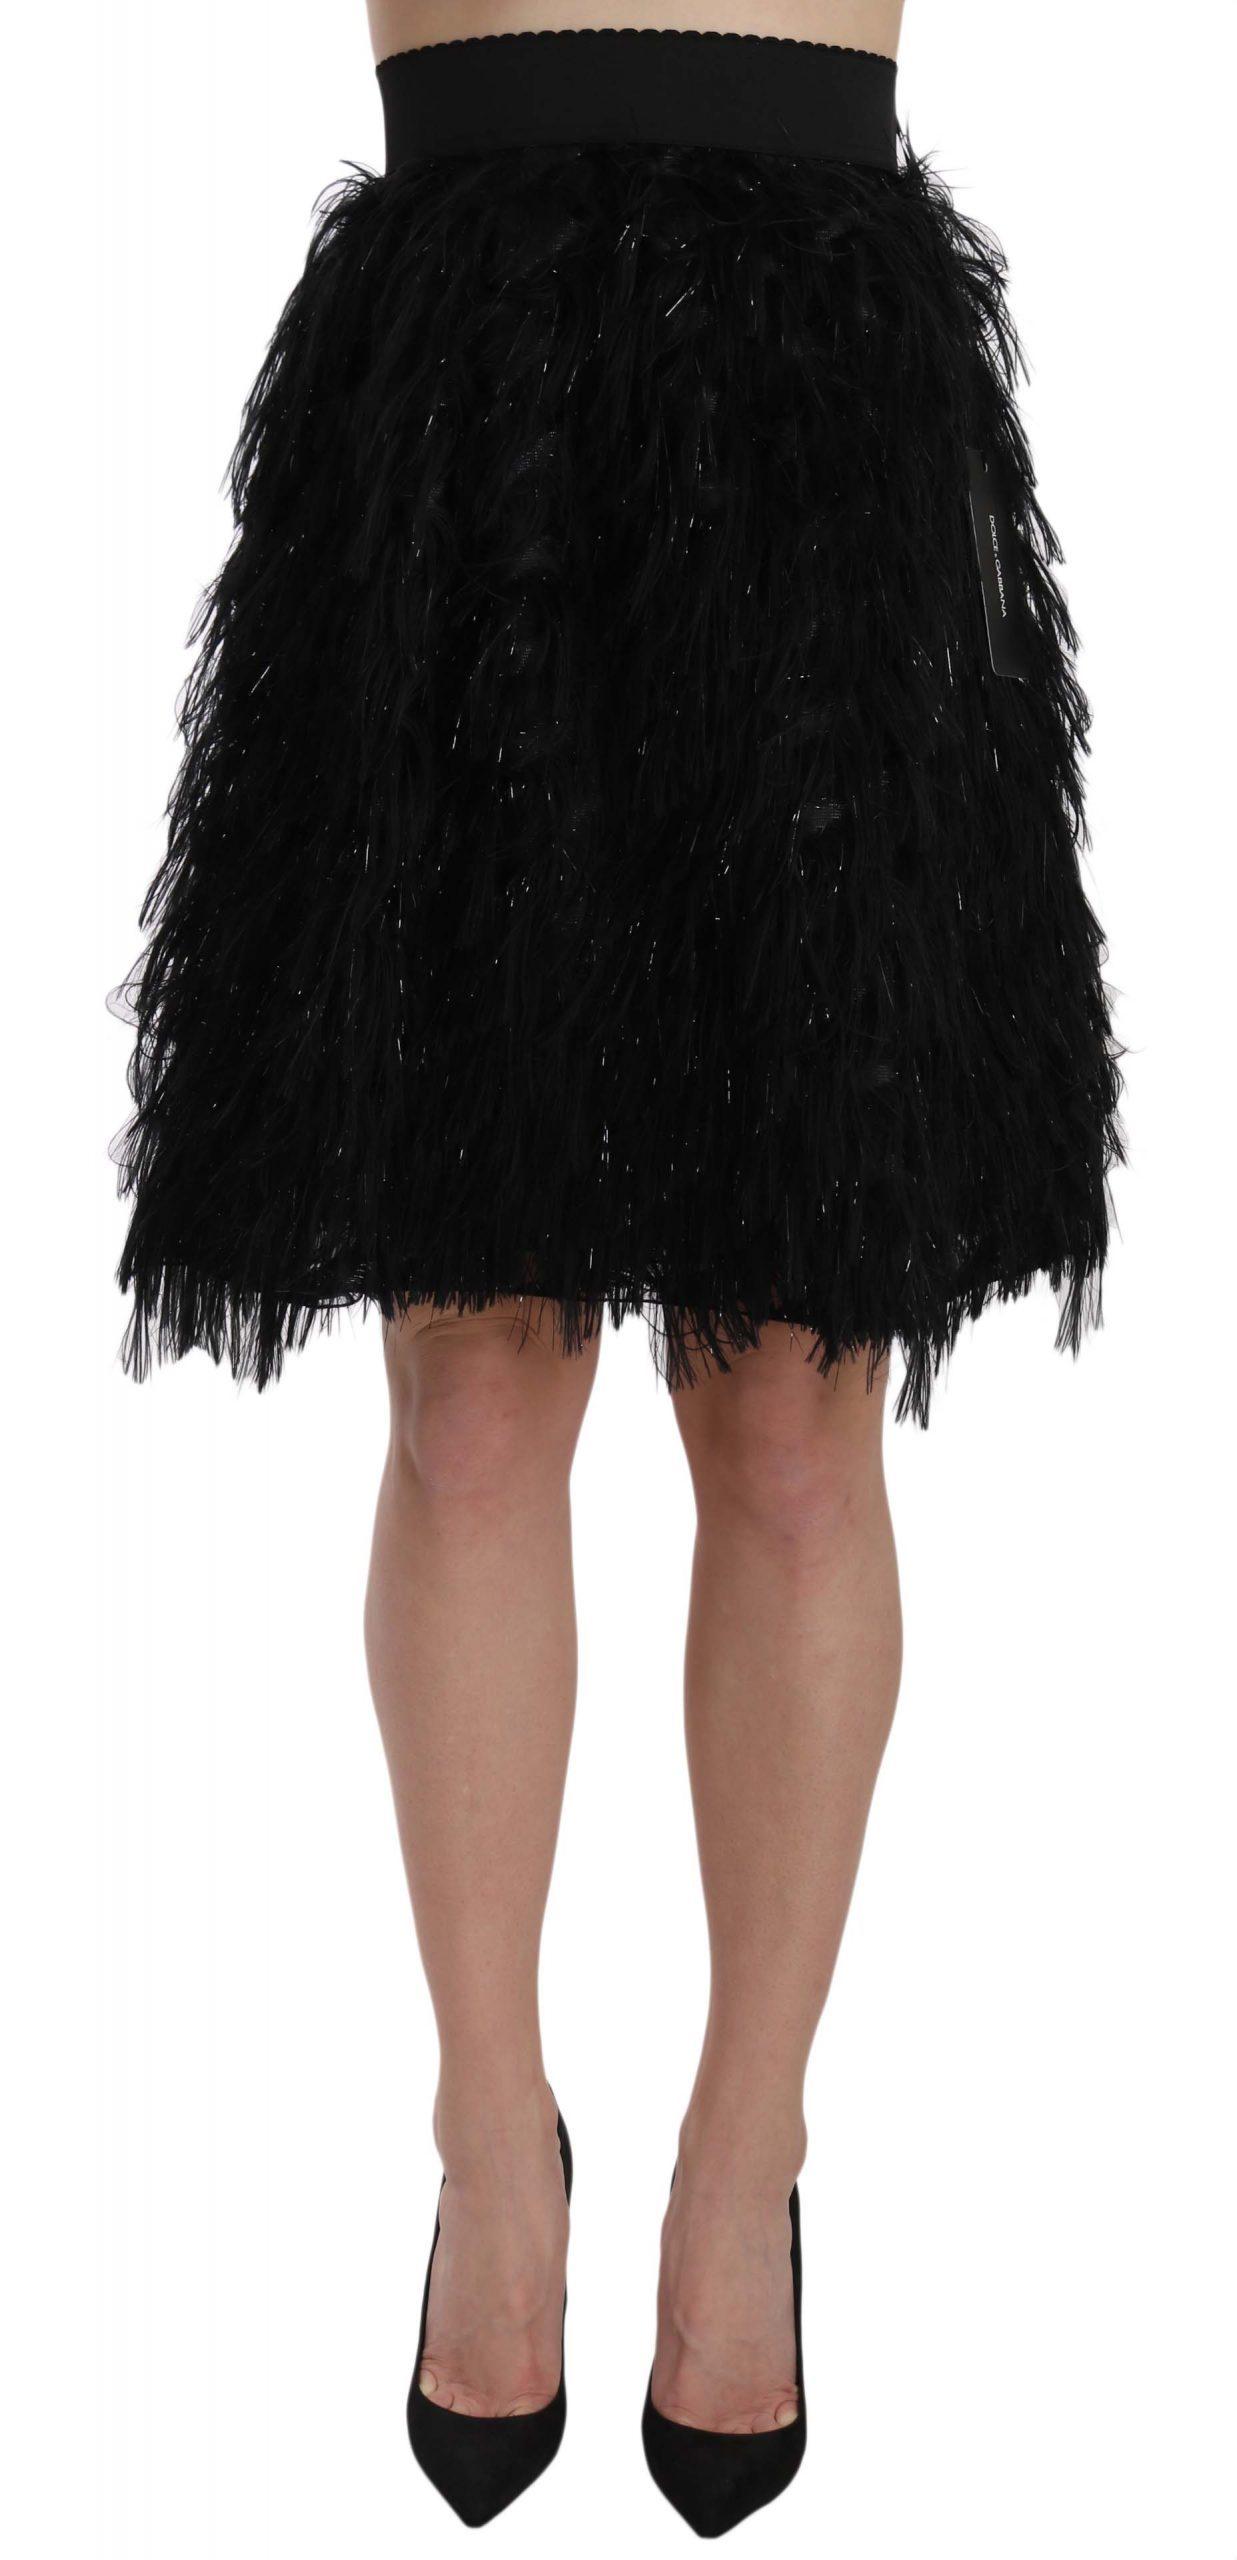 Dolce & Gabbana Women's Fringe Metallic Mini A-line Skirt Black SKI1176 - IT38|XS